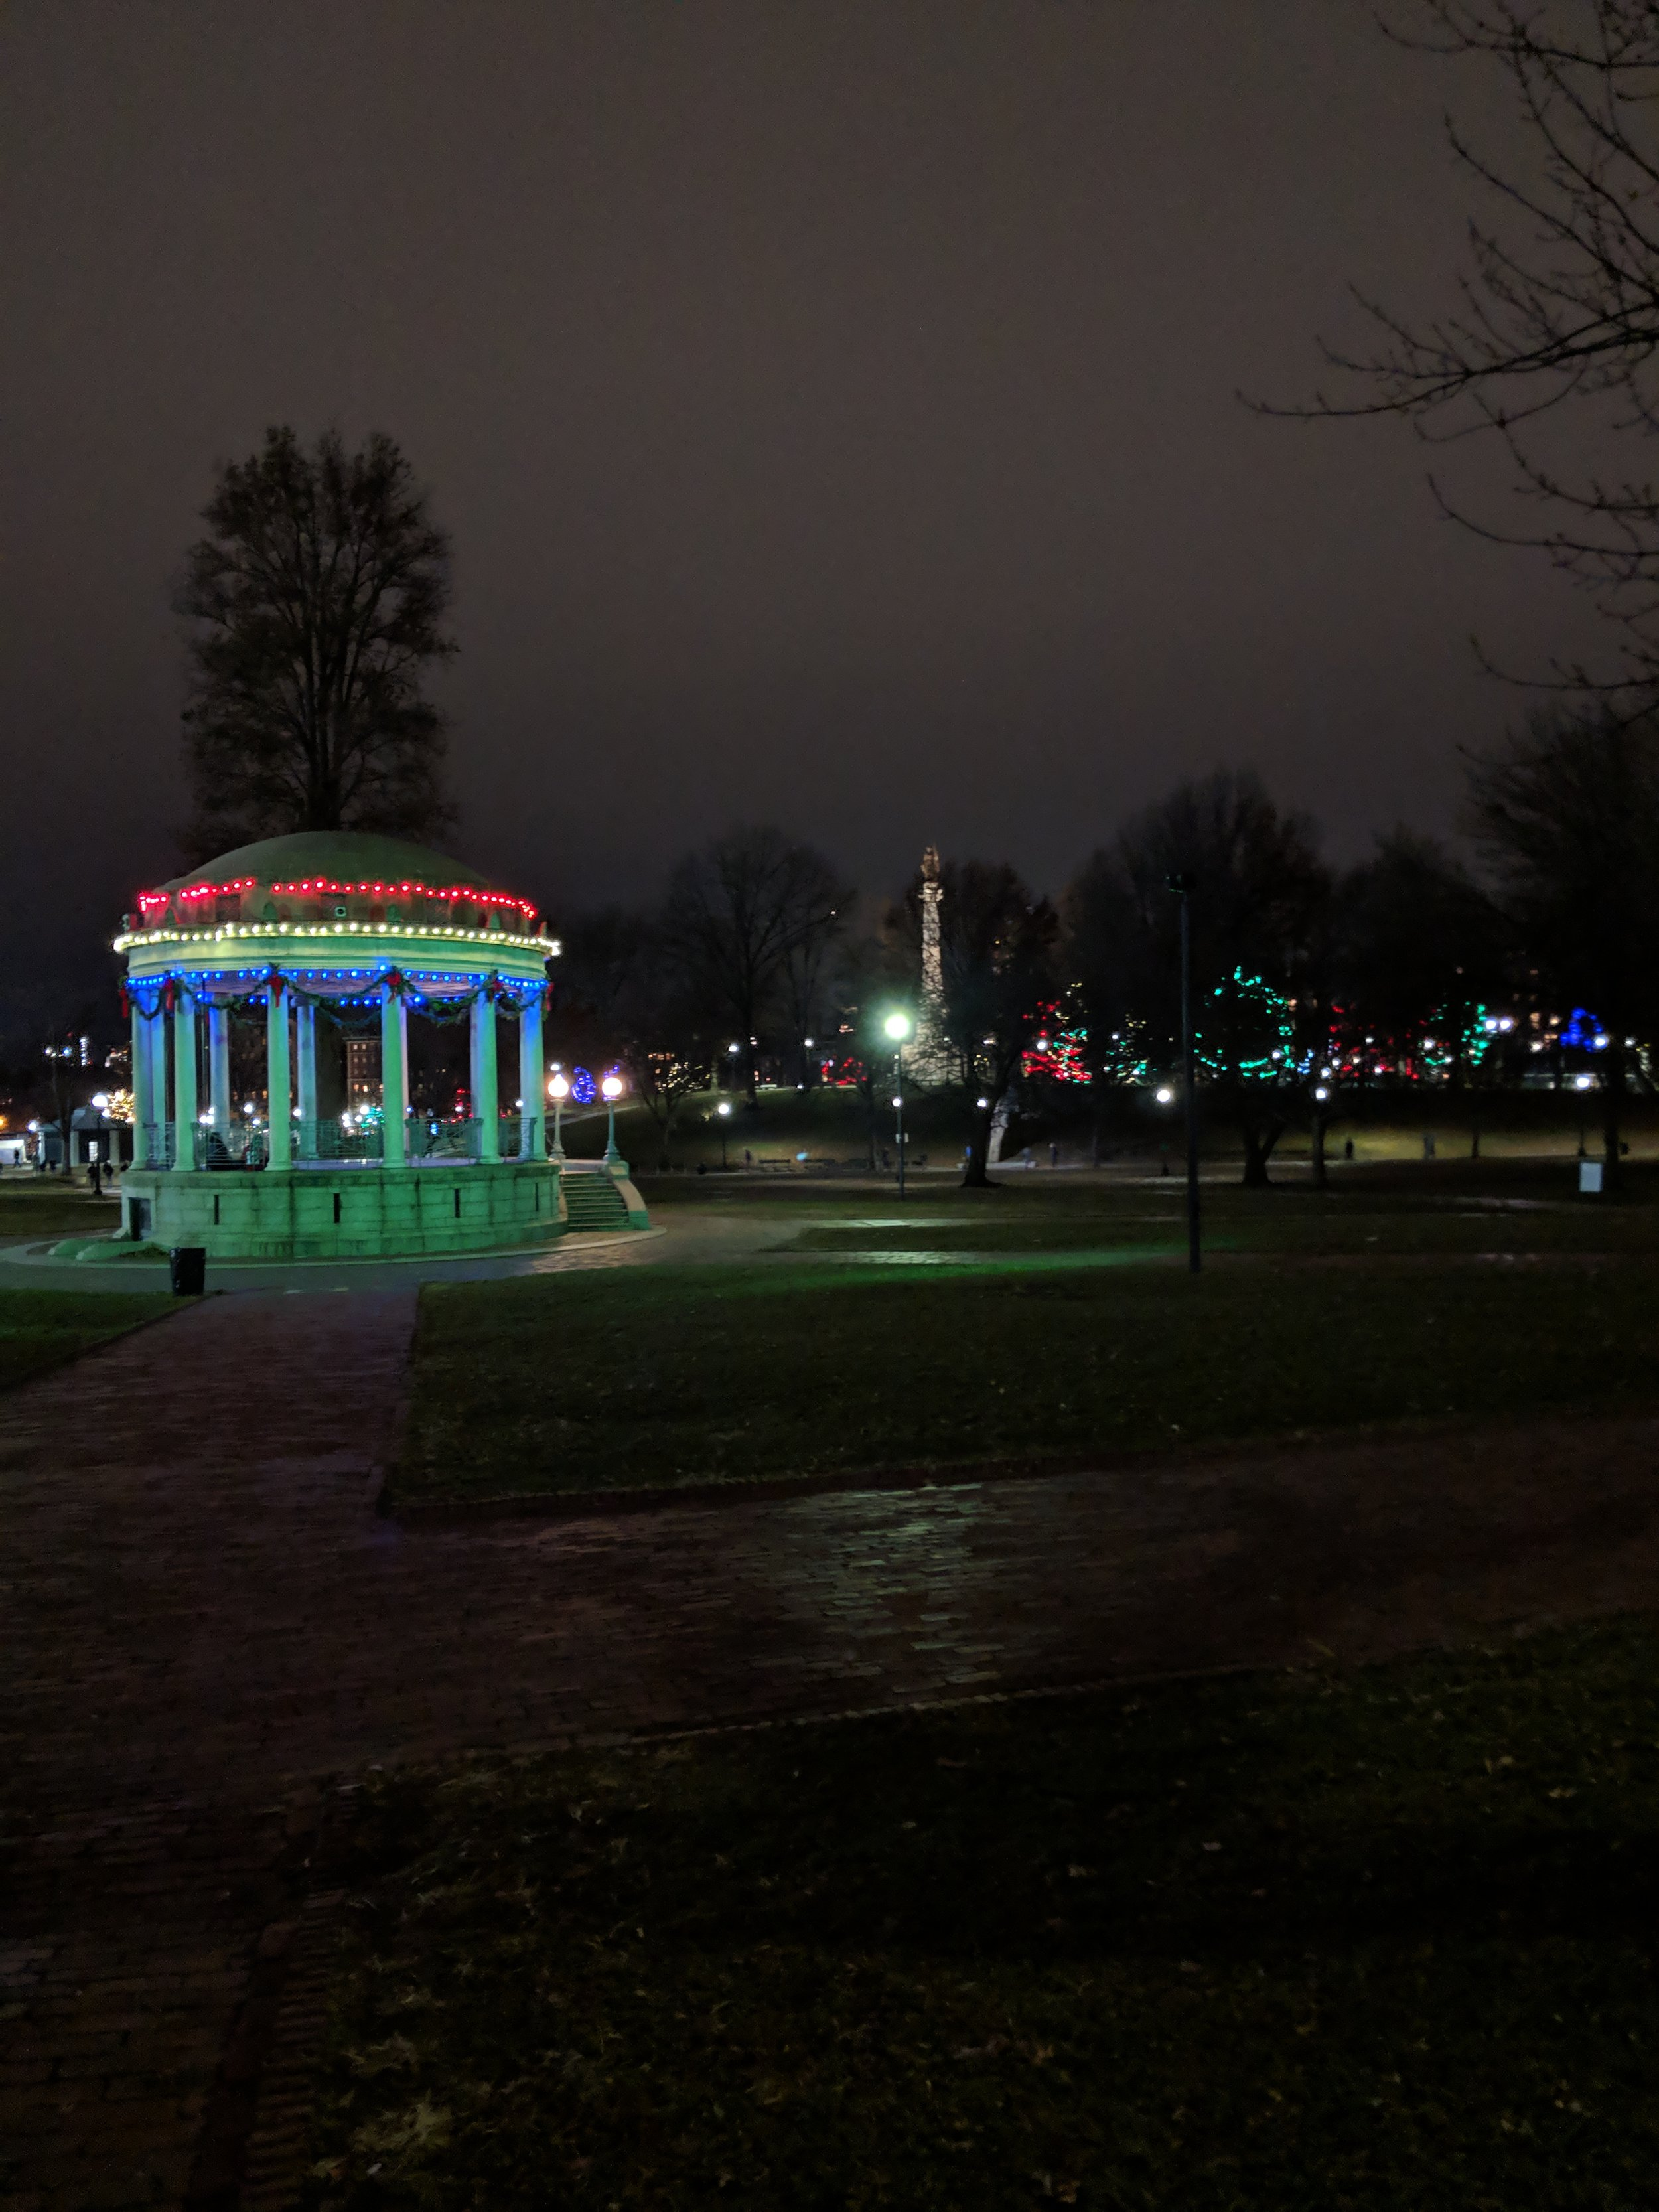 bri rinehart; photography; boston; lights; Christmas